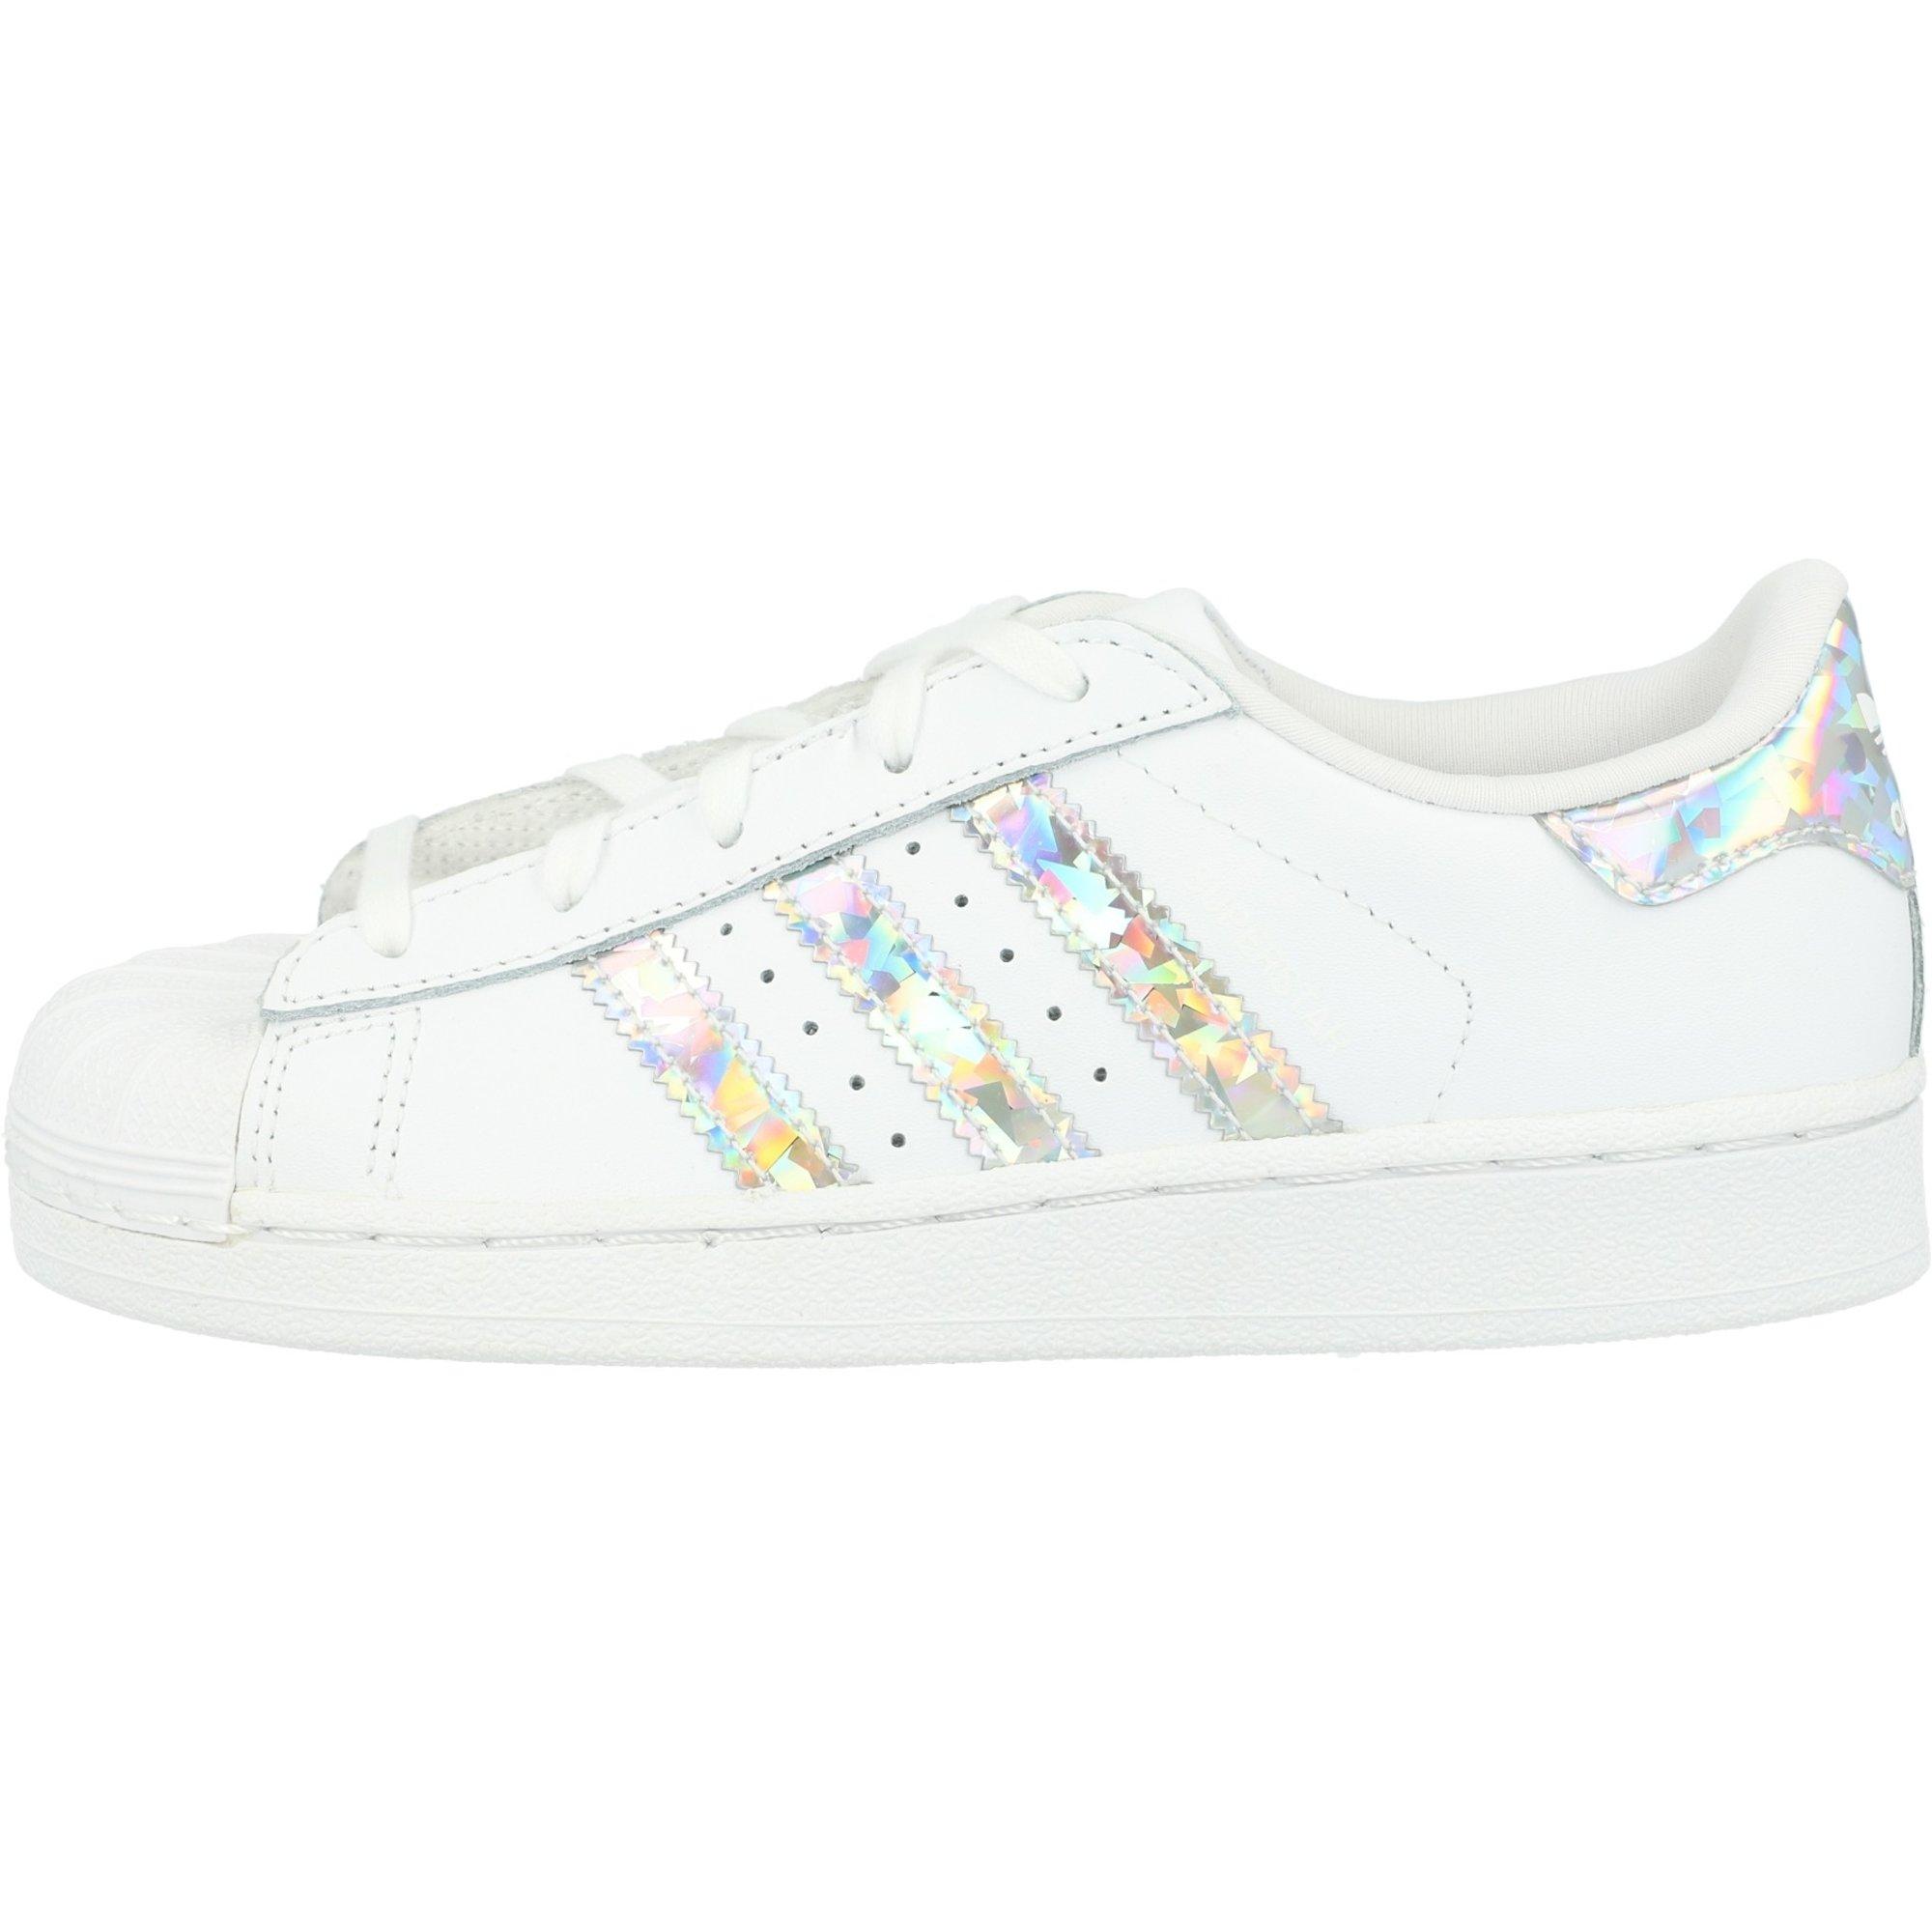 adidas Originals Superstar C White/Silver Leather